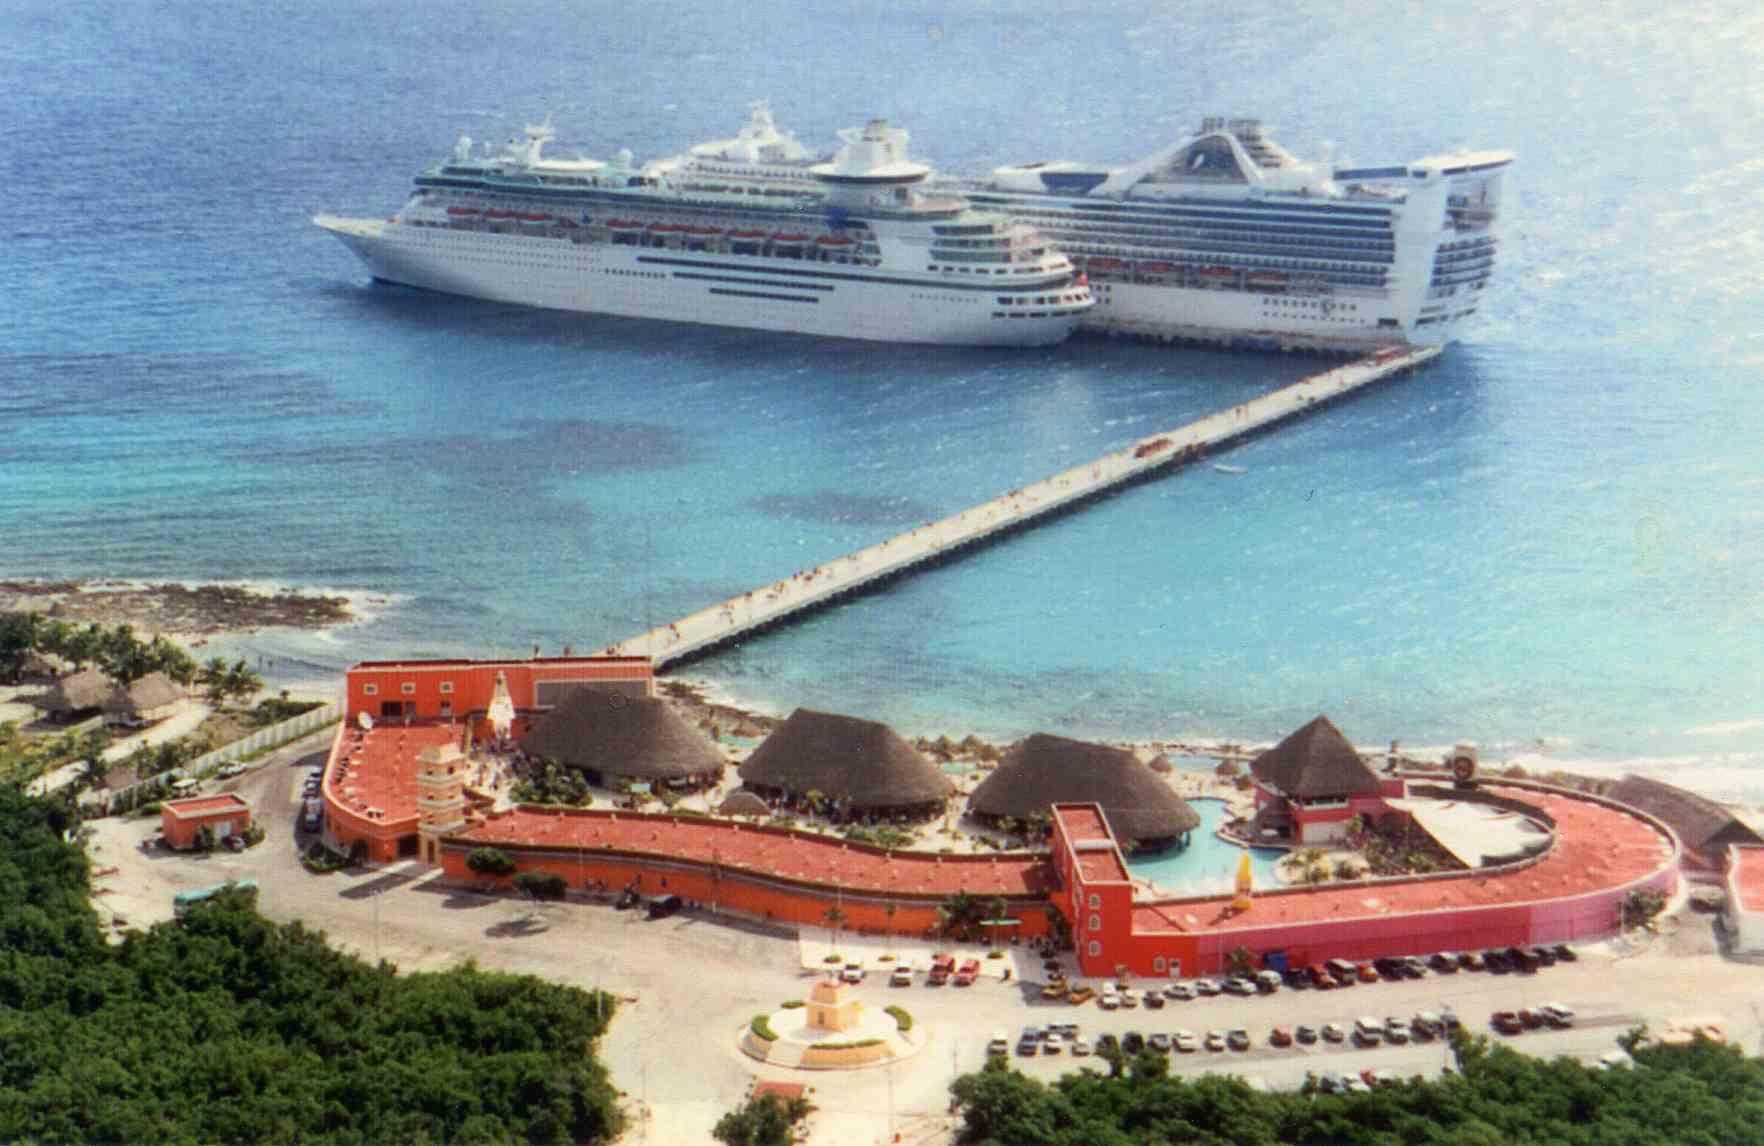 Mahahual Cruise Dock